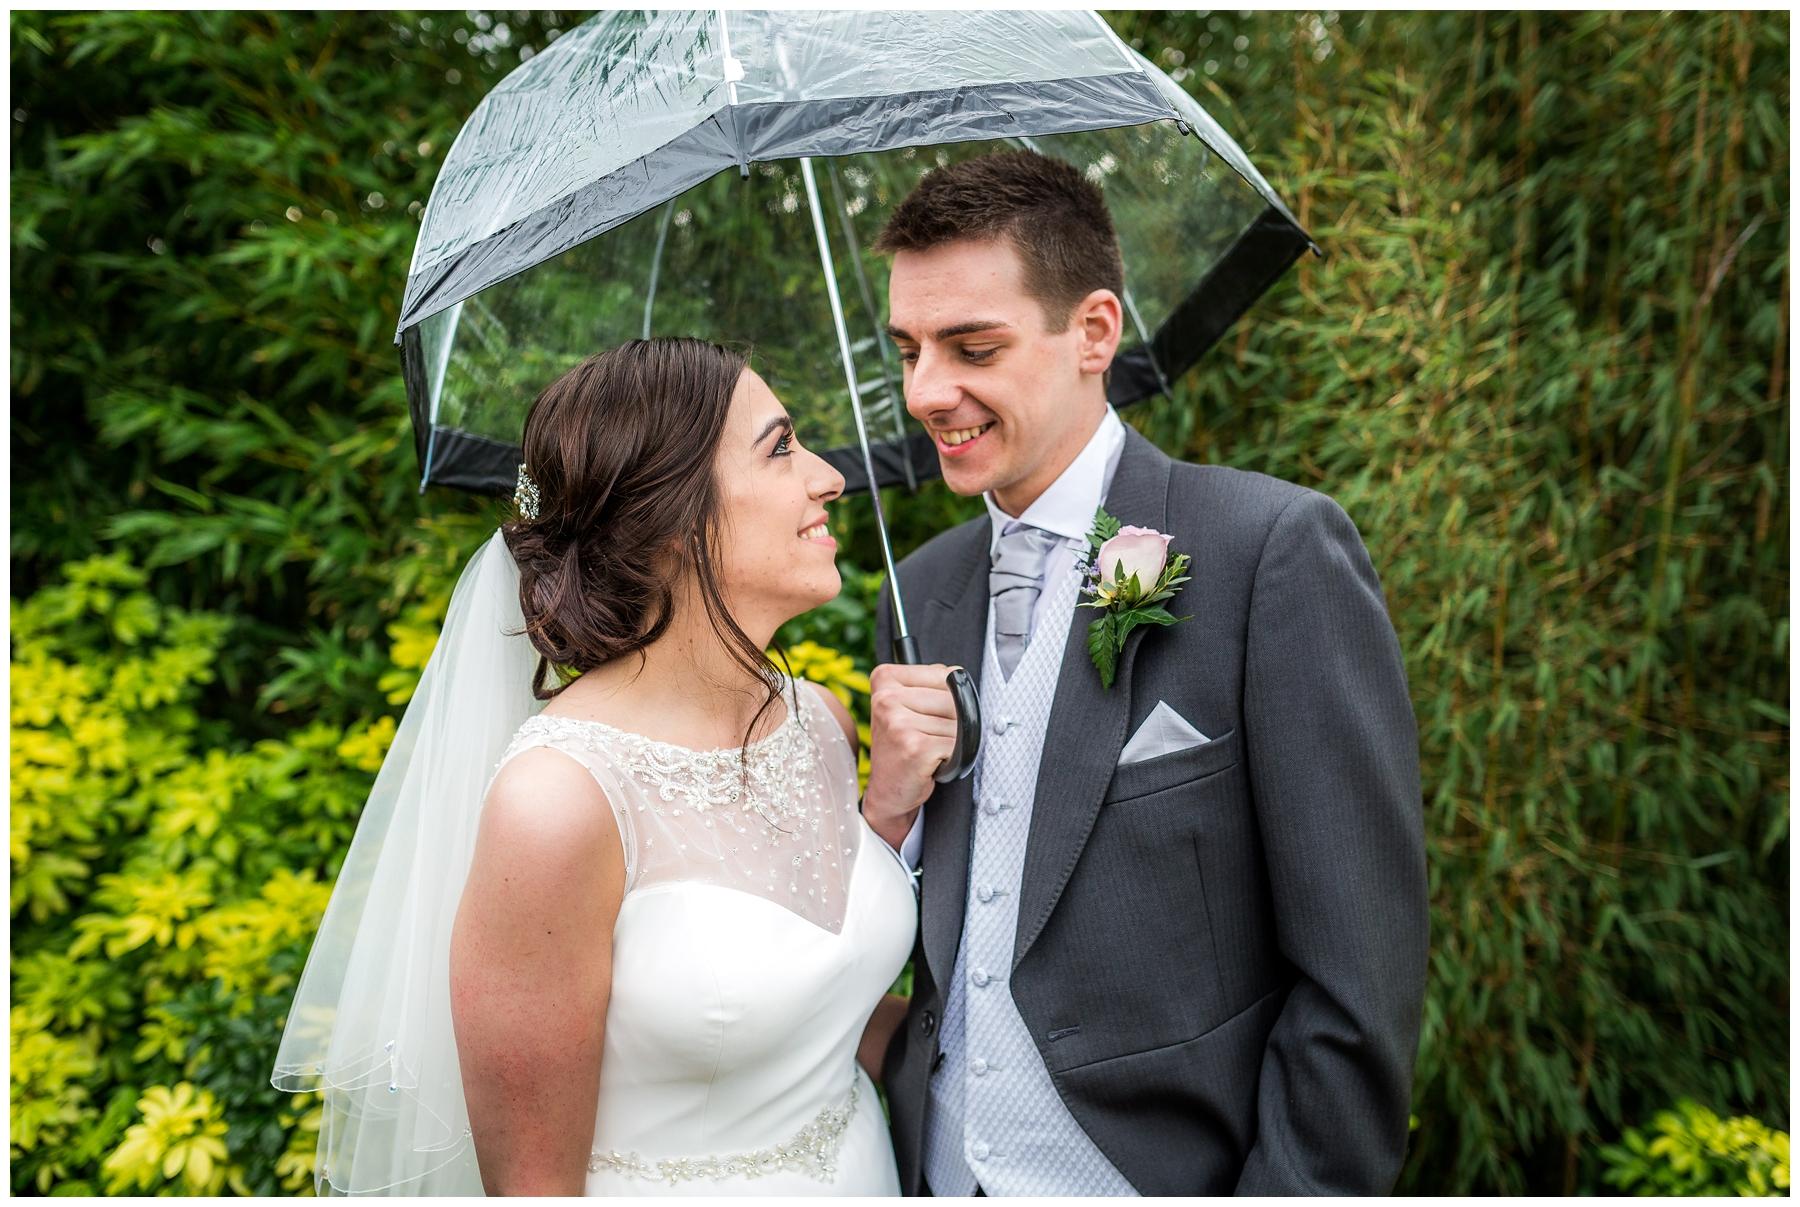 holland-hall-wedding-photography-becky-jason_0031.jpg